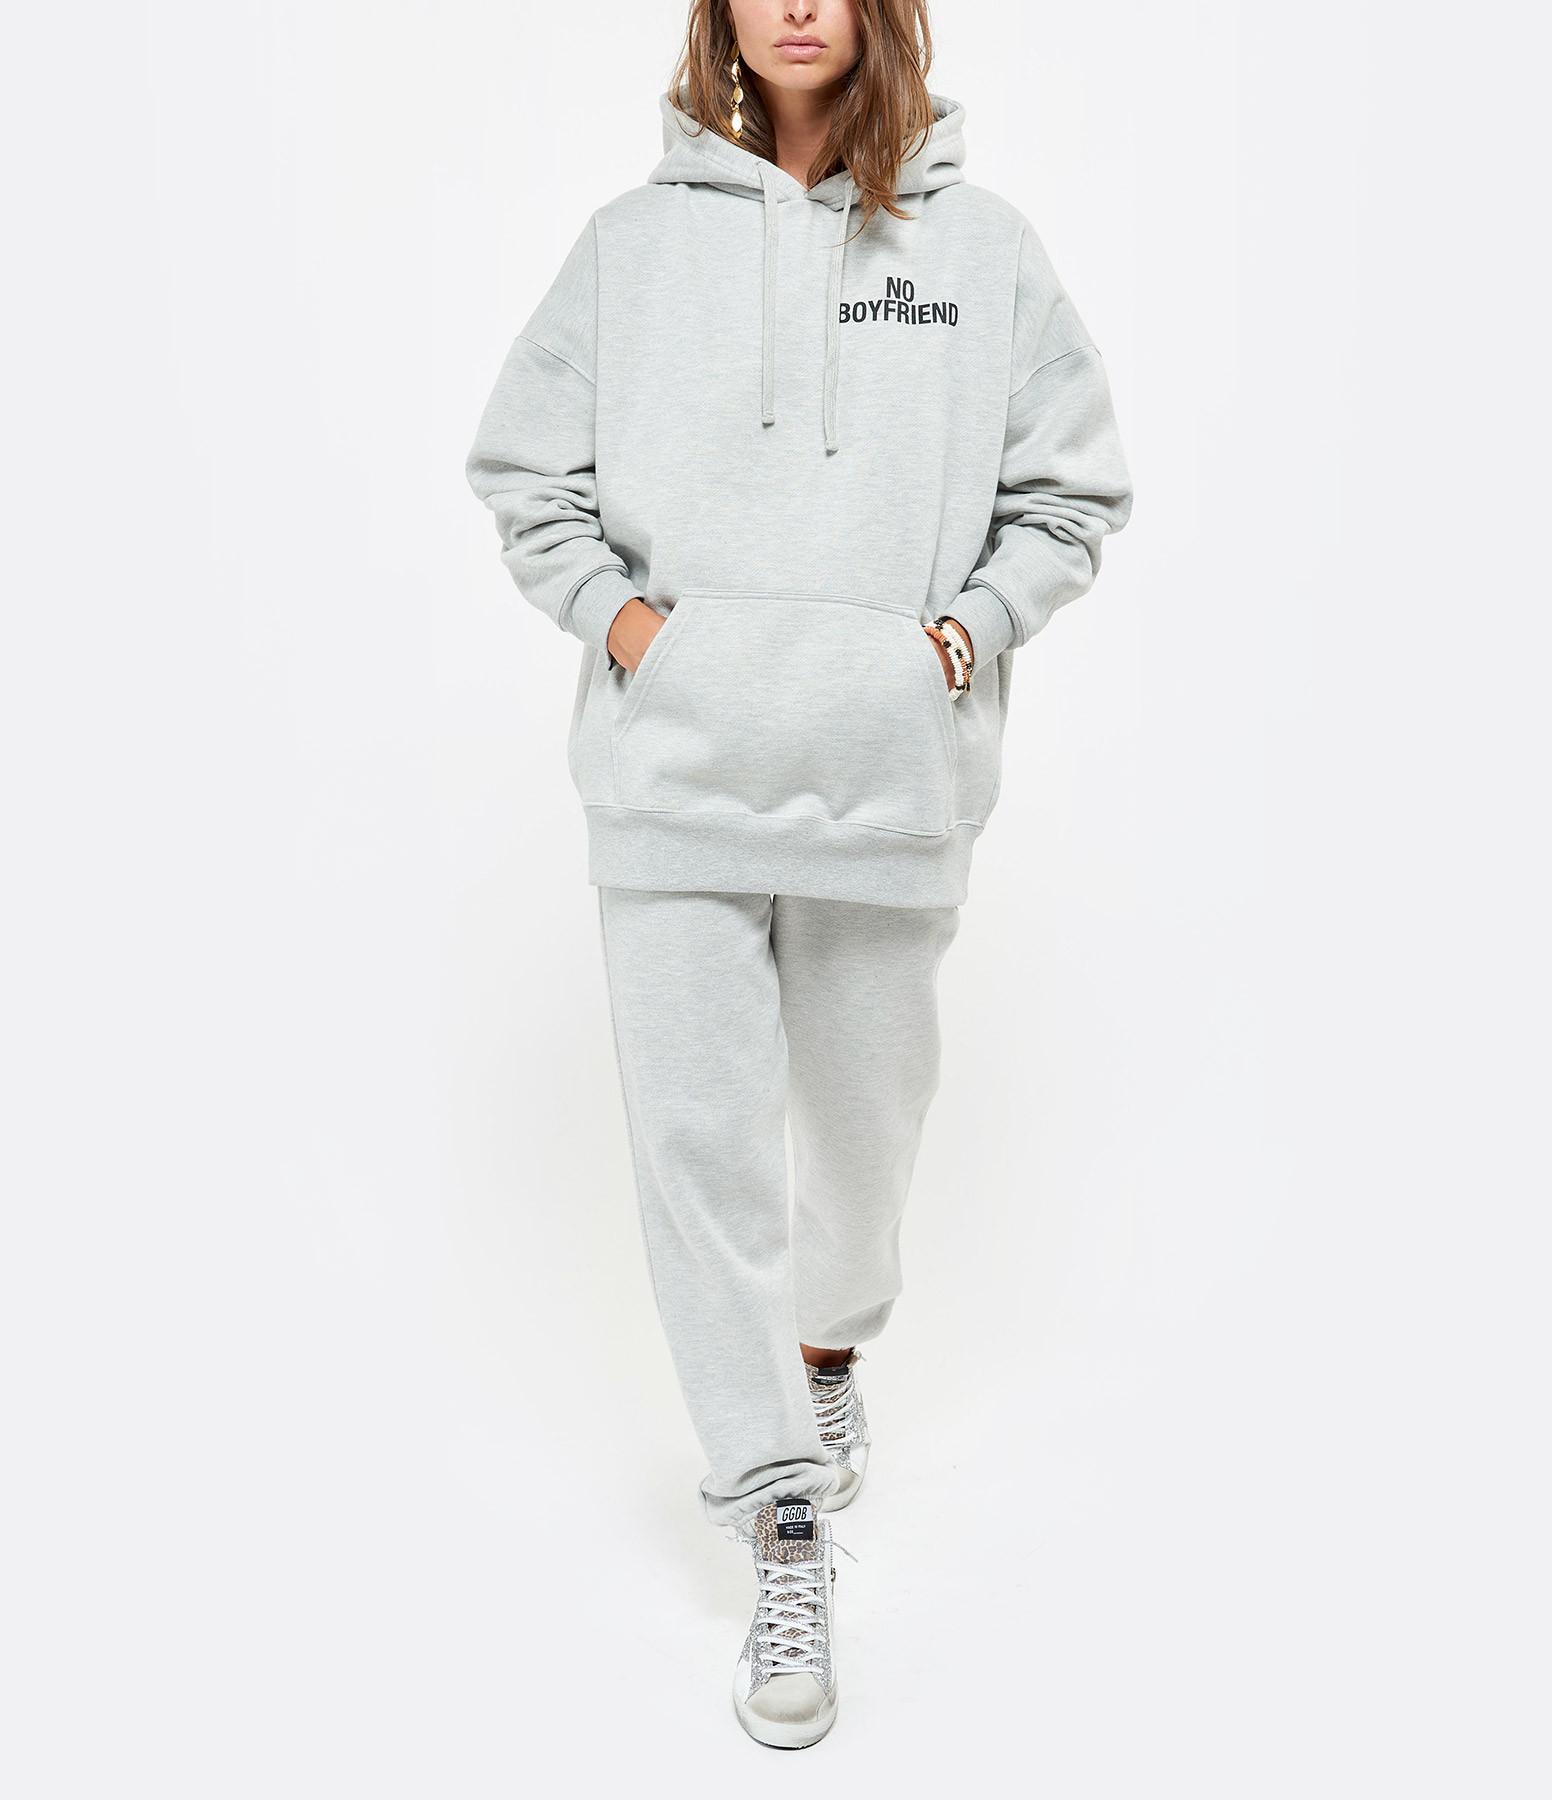 IRO - Sweatshirt Clava Coton Gris